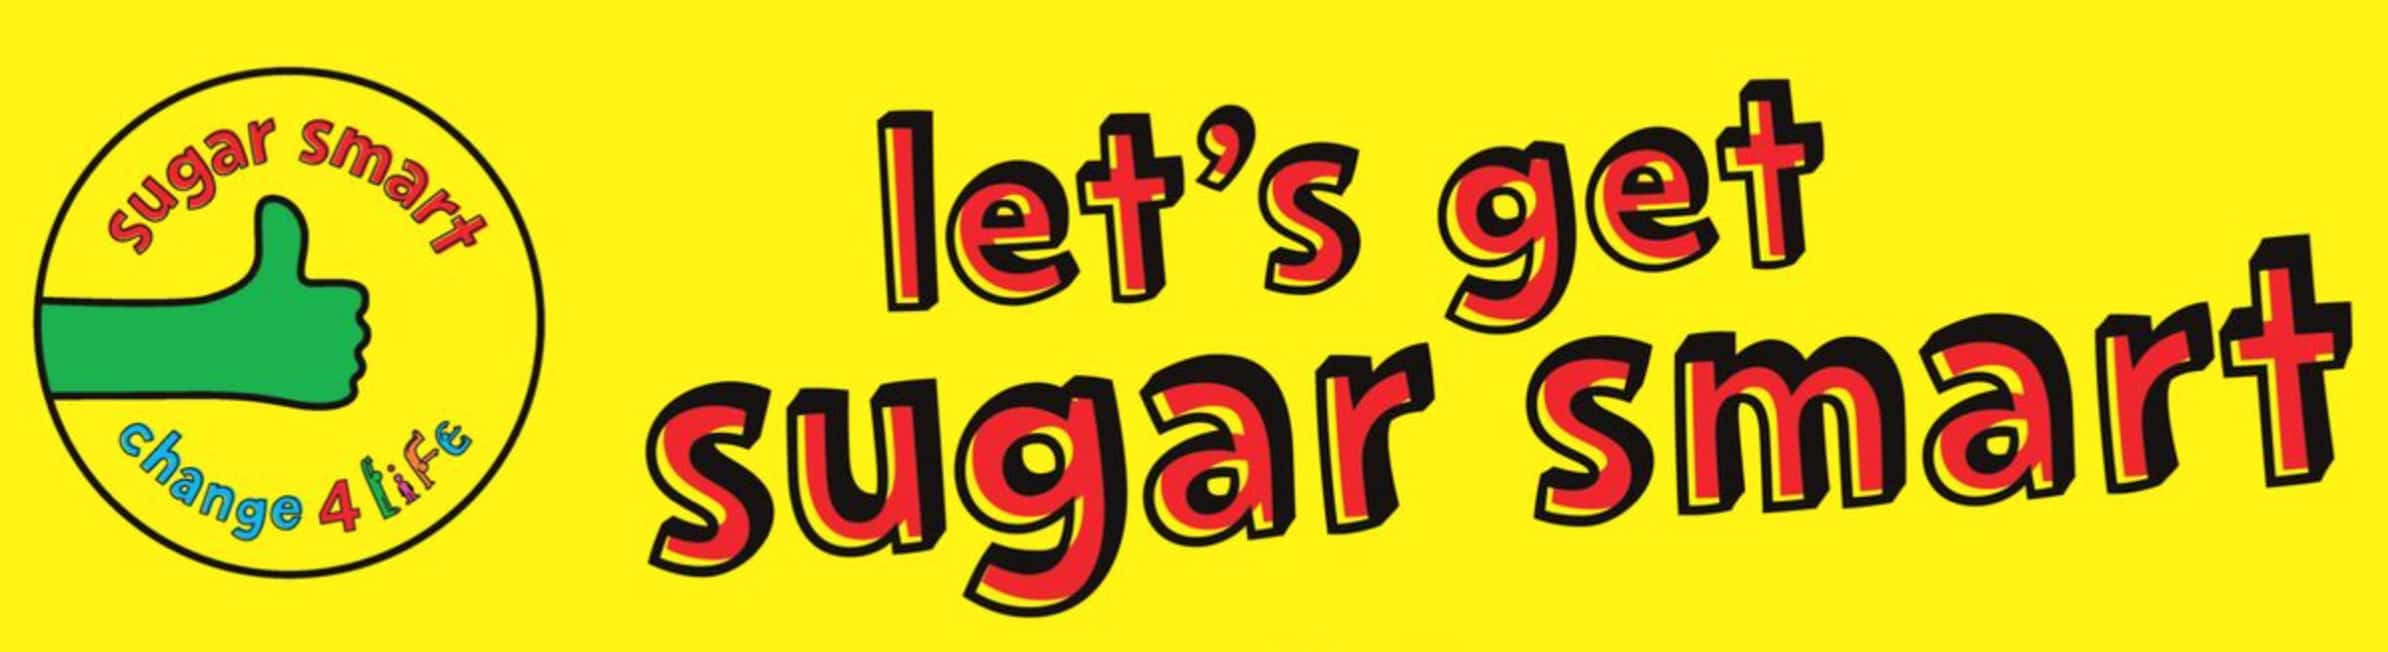 Be Sugar Smart!